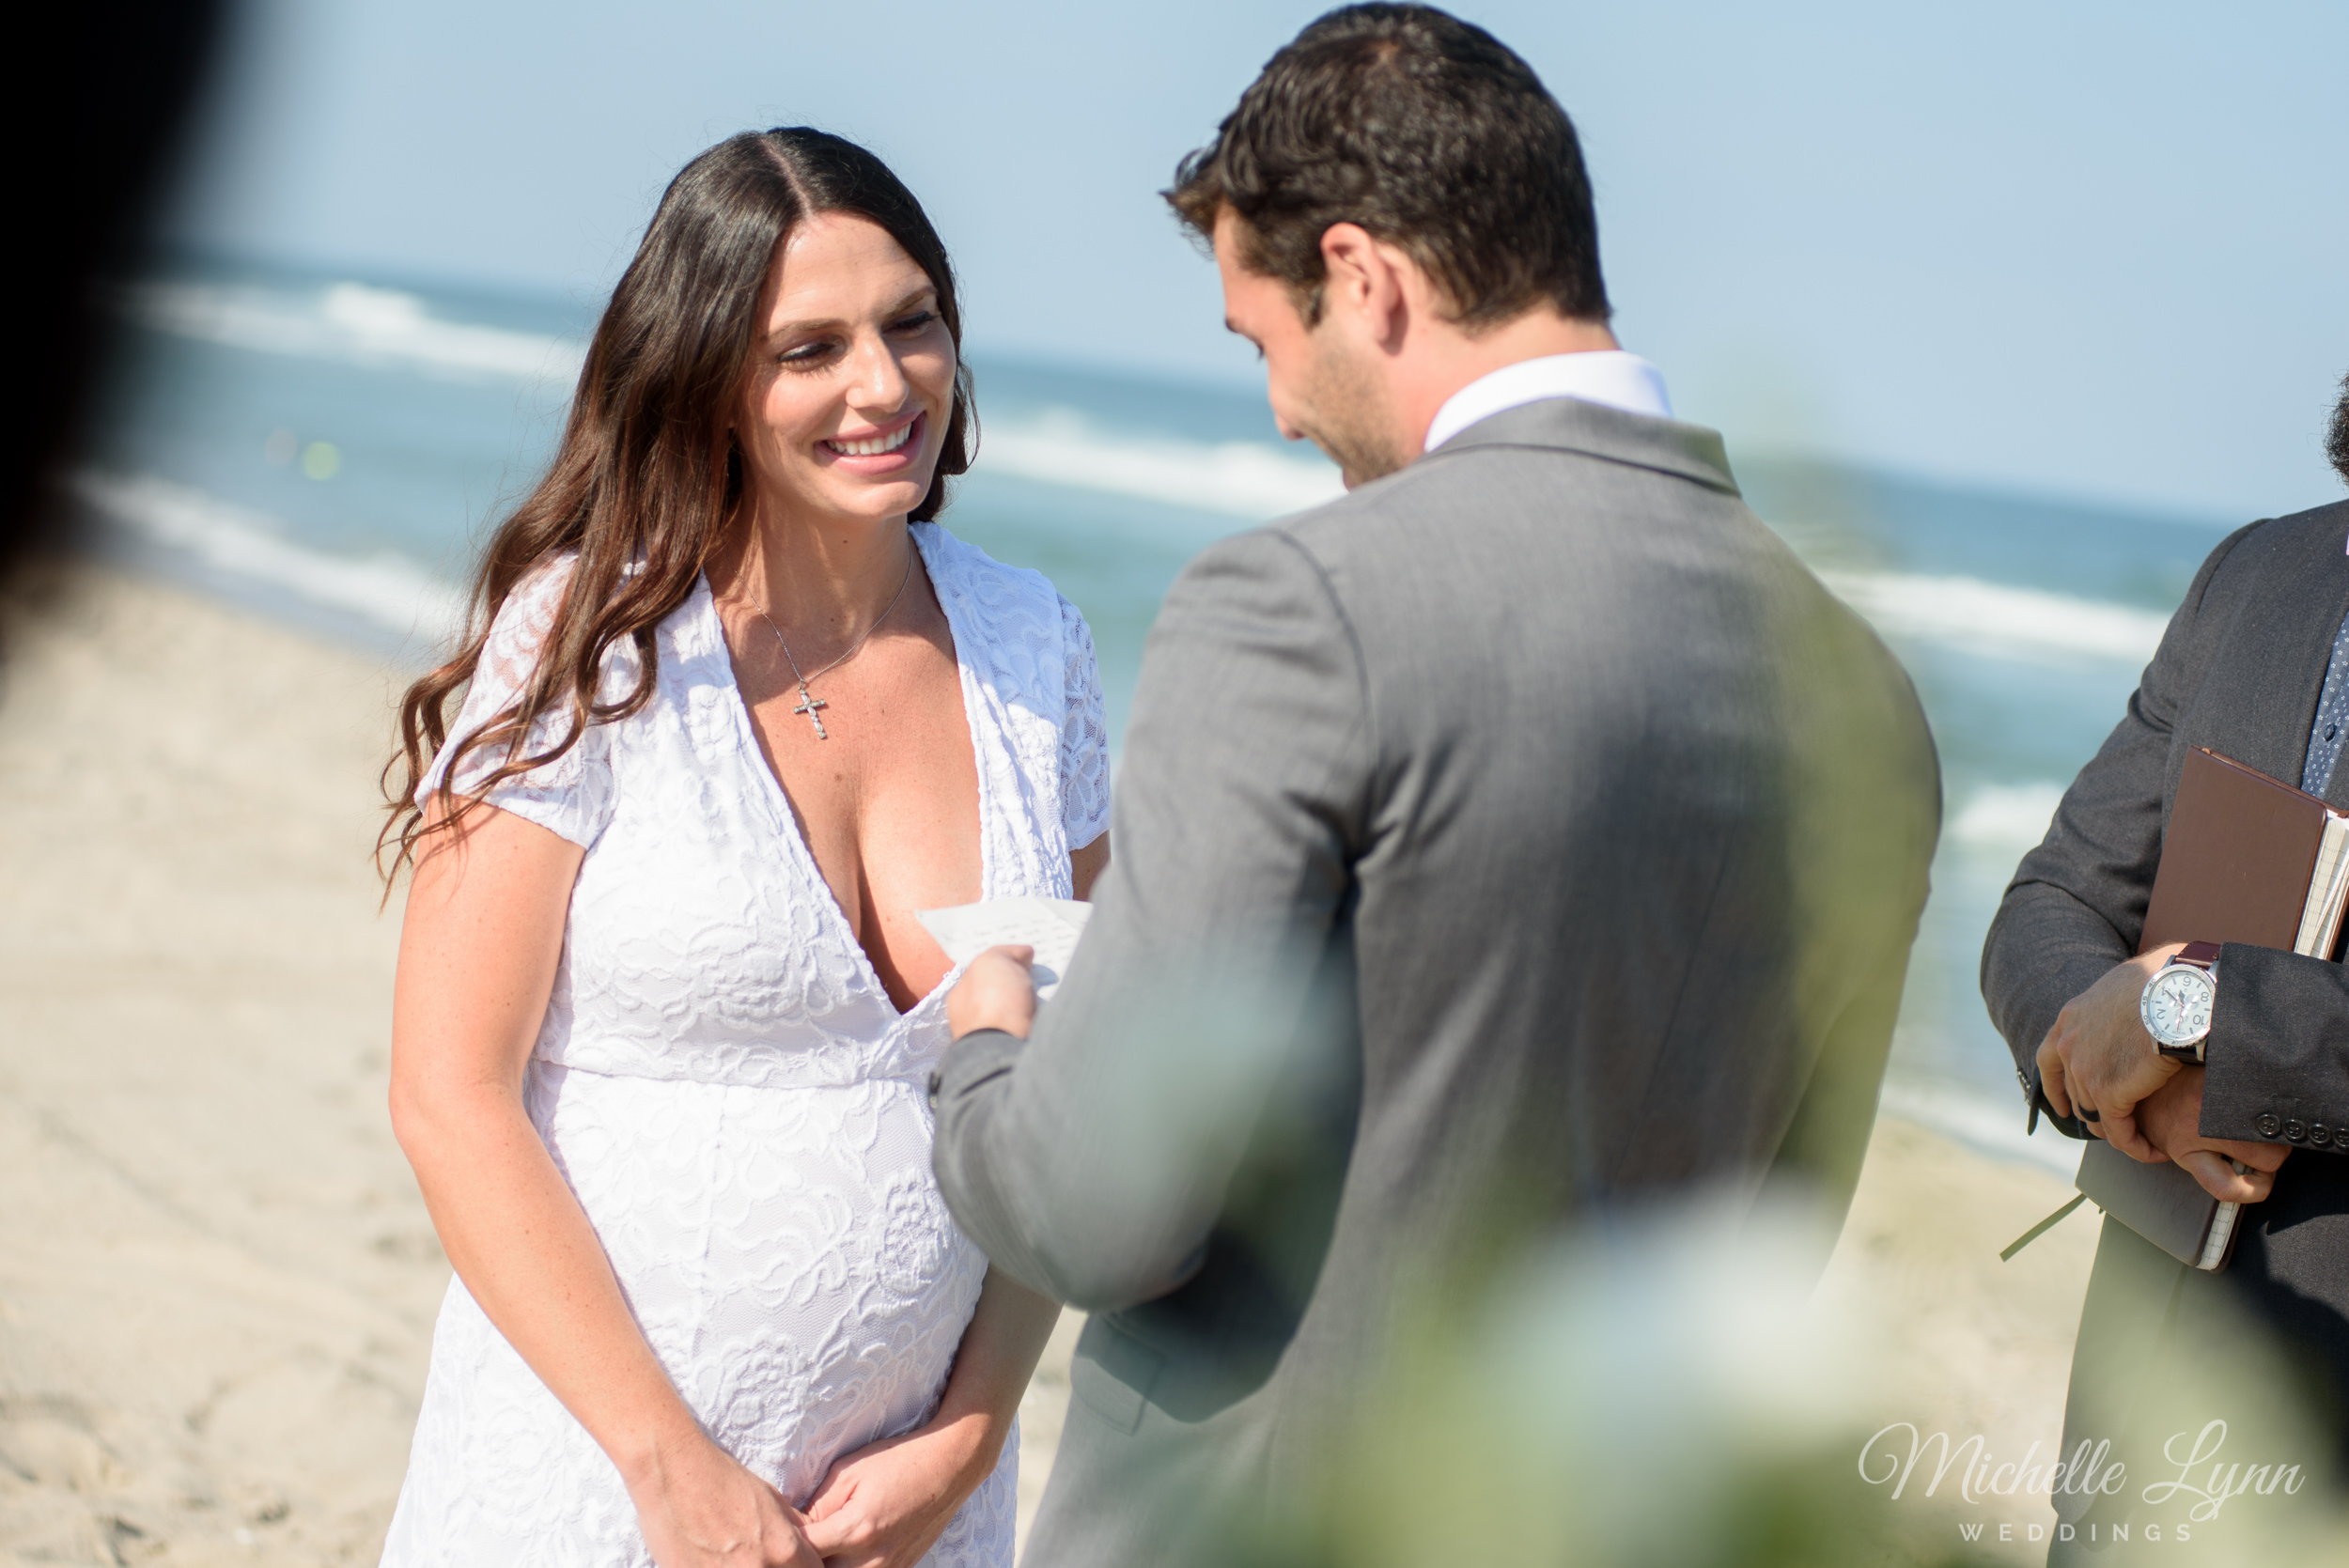 mlw-brant-beach-lbi-wedding-photography-23.jpg